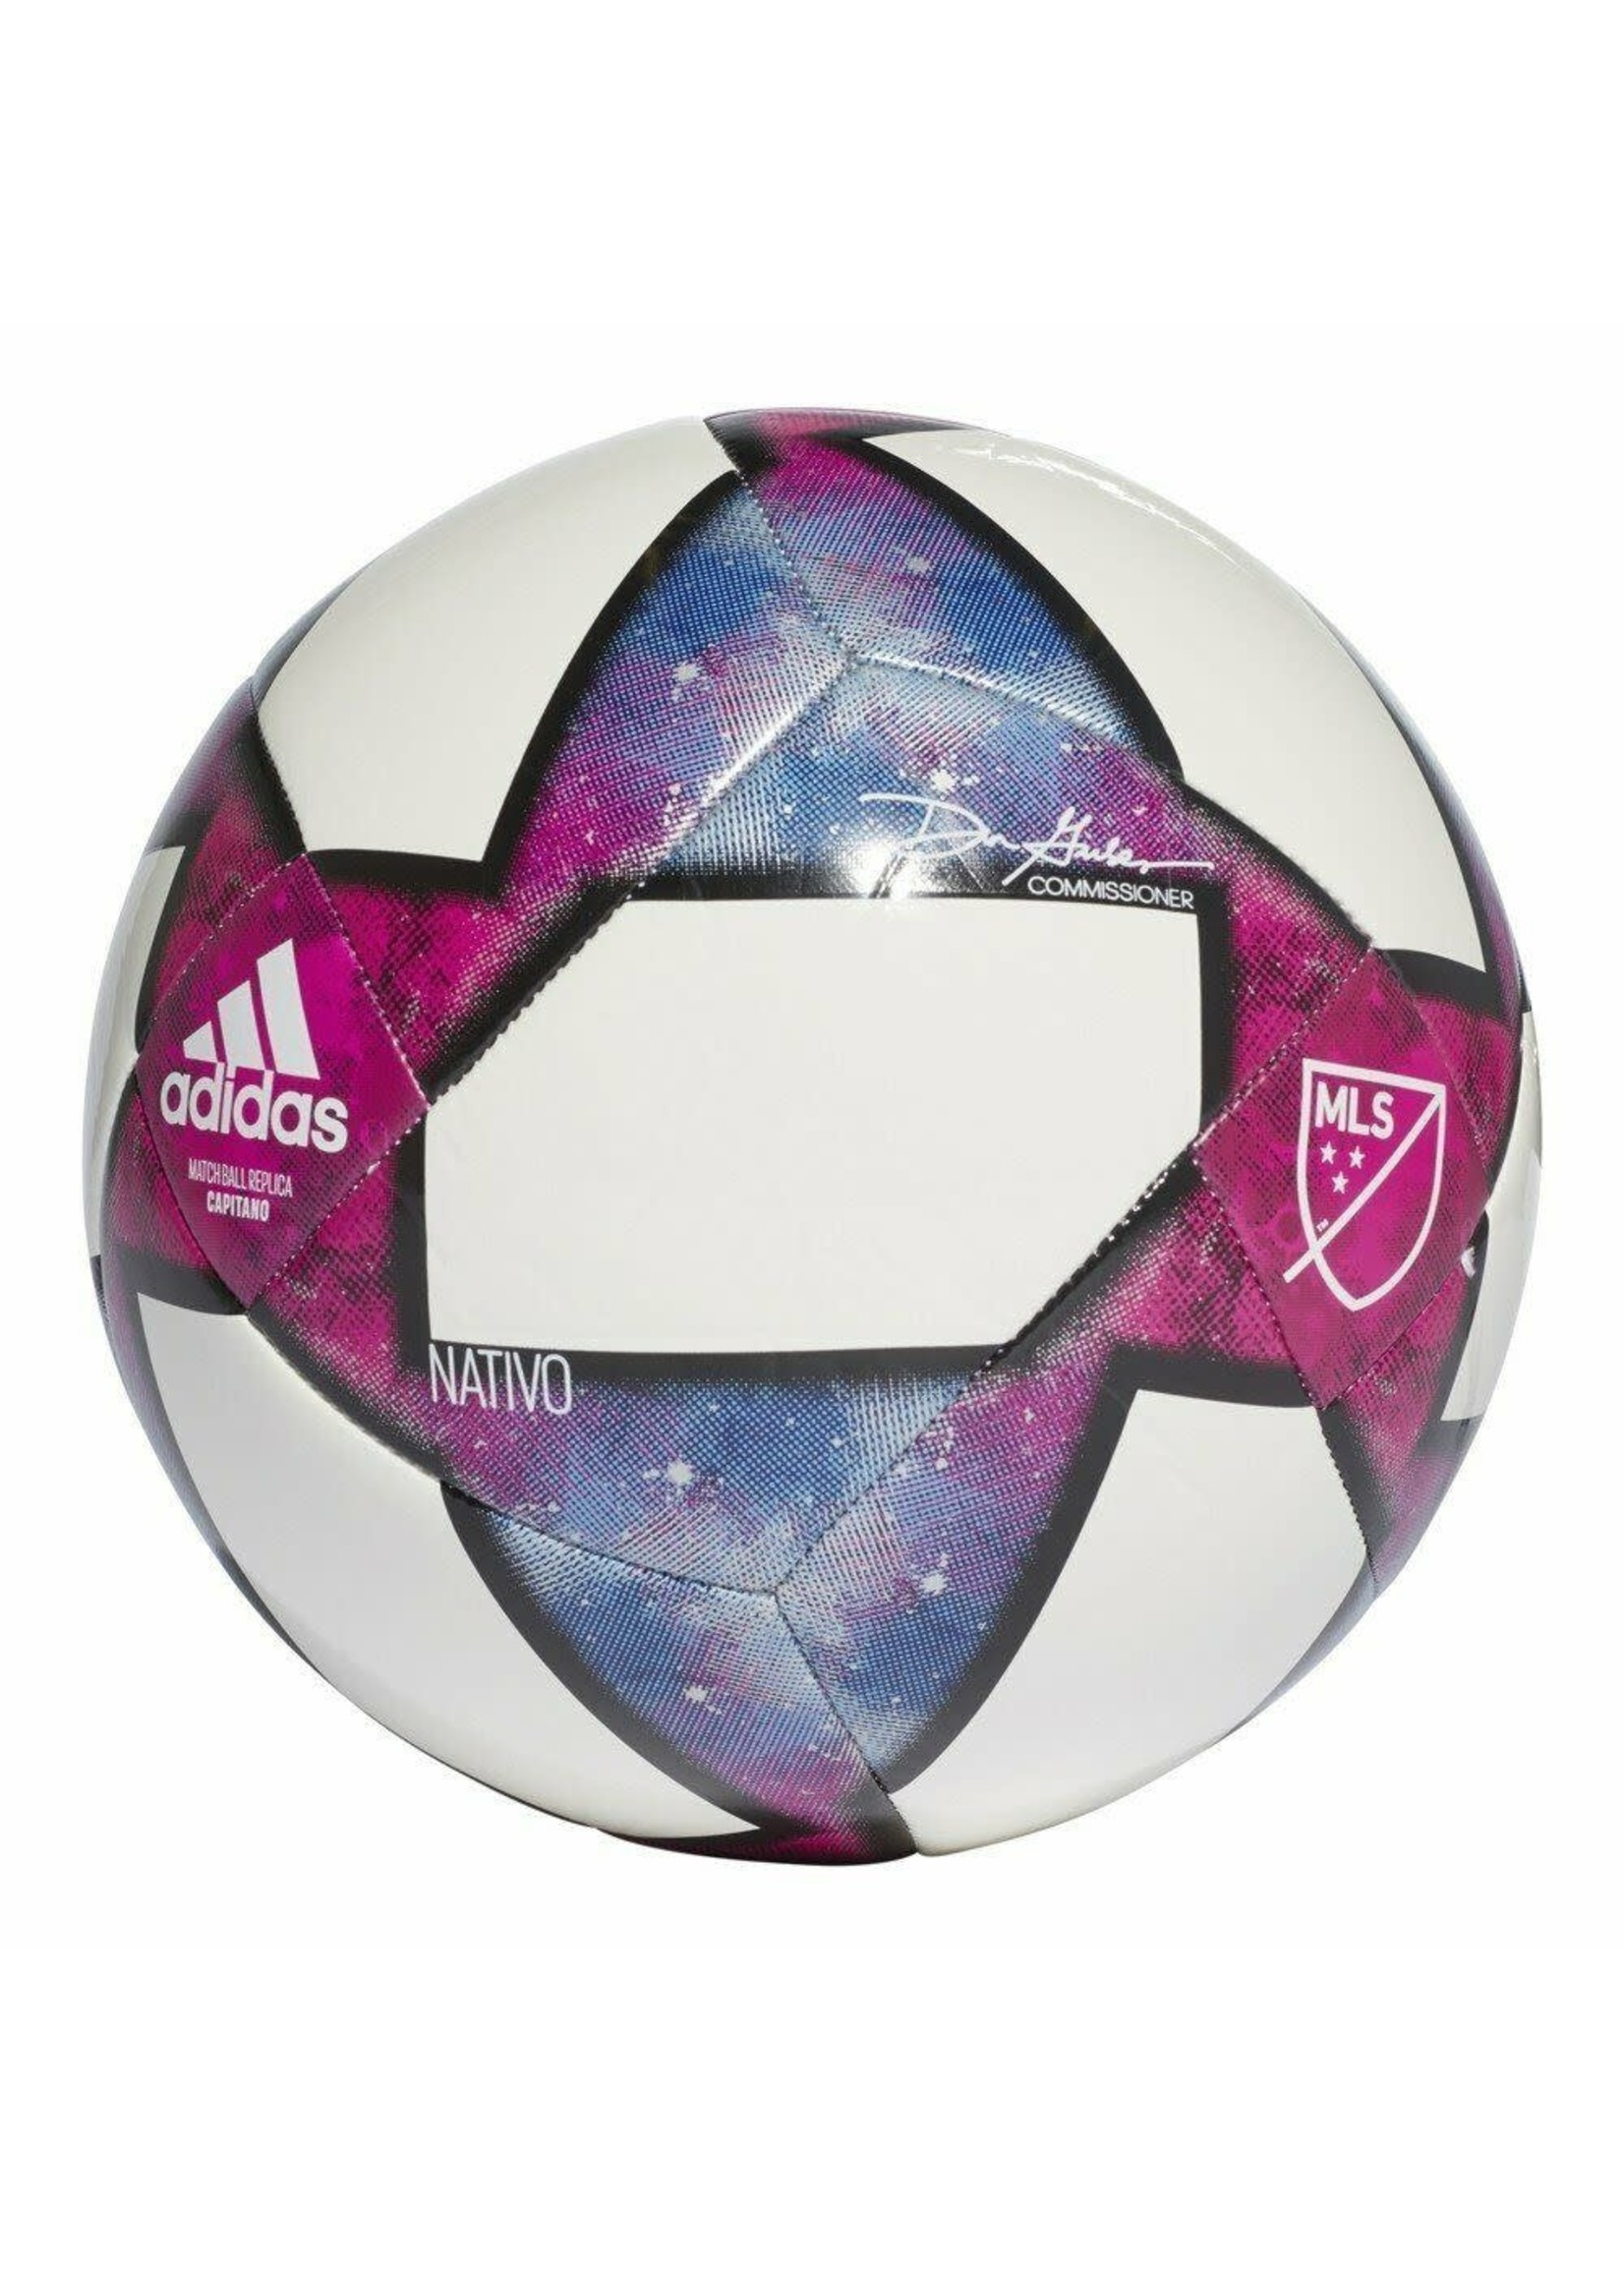 Adidas MLS CPT BALL